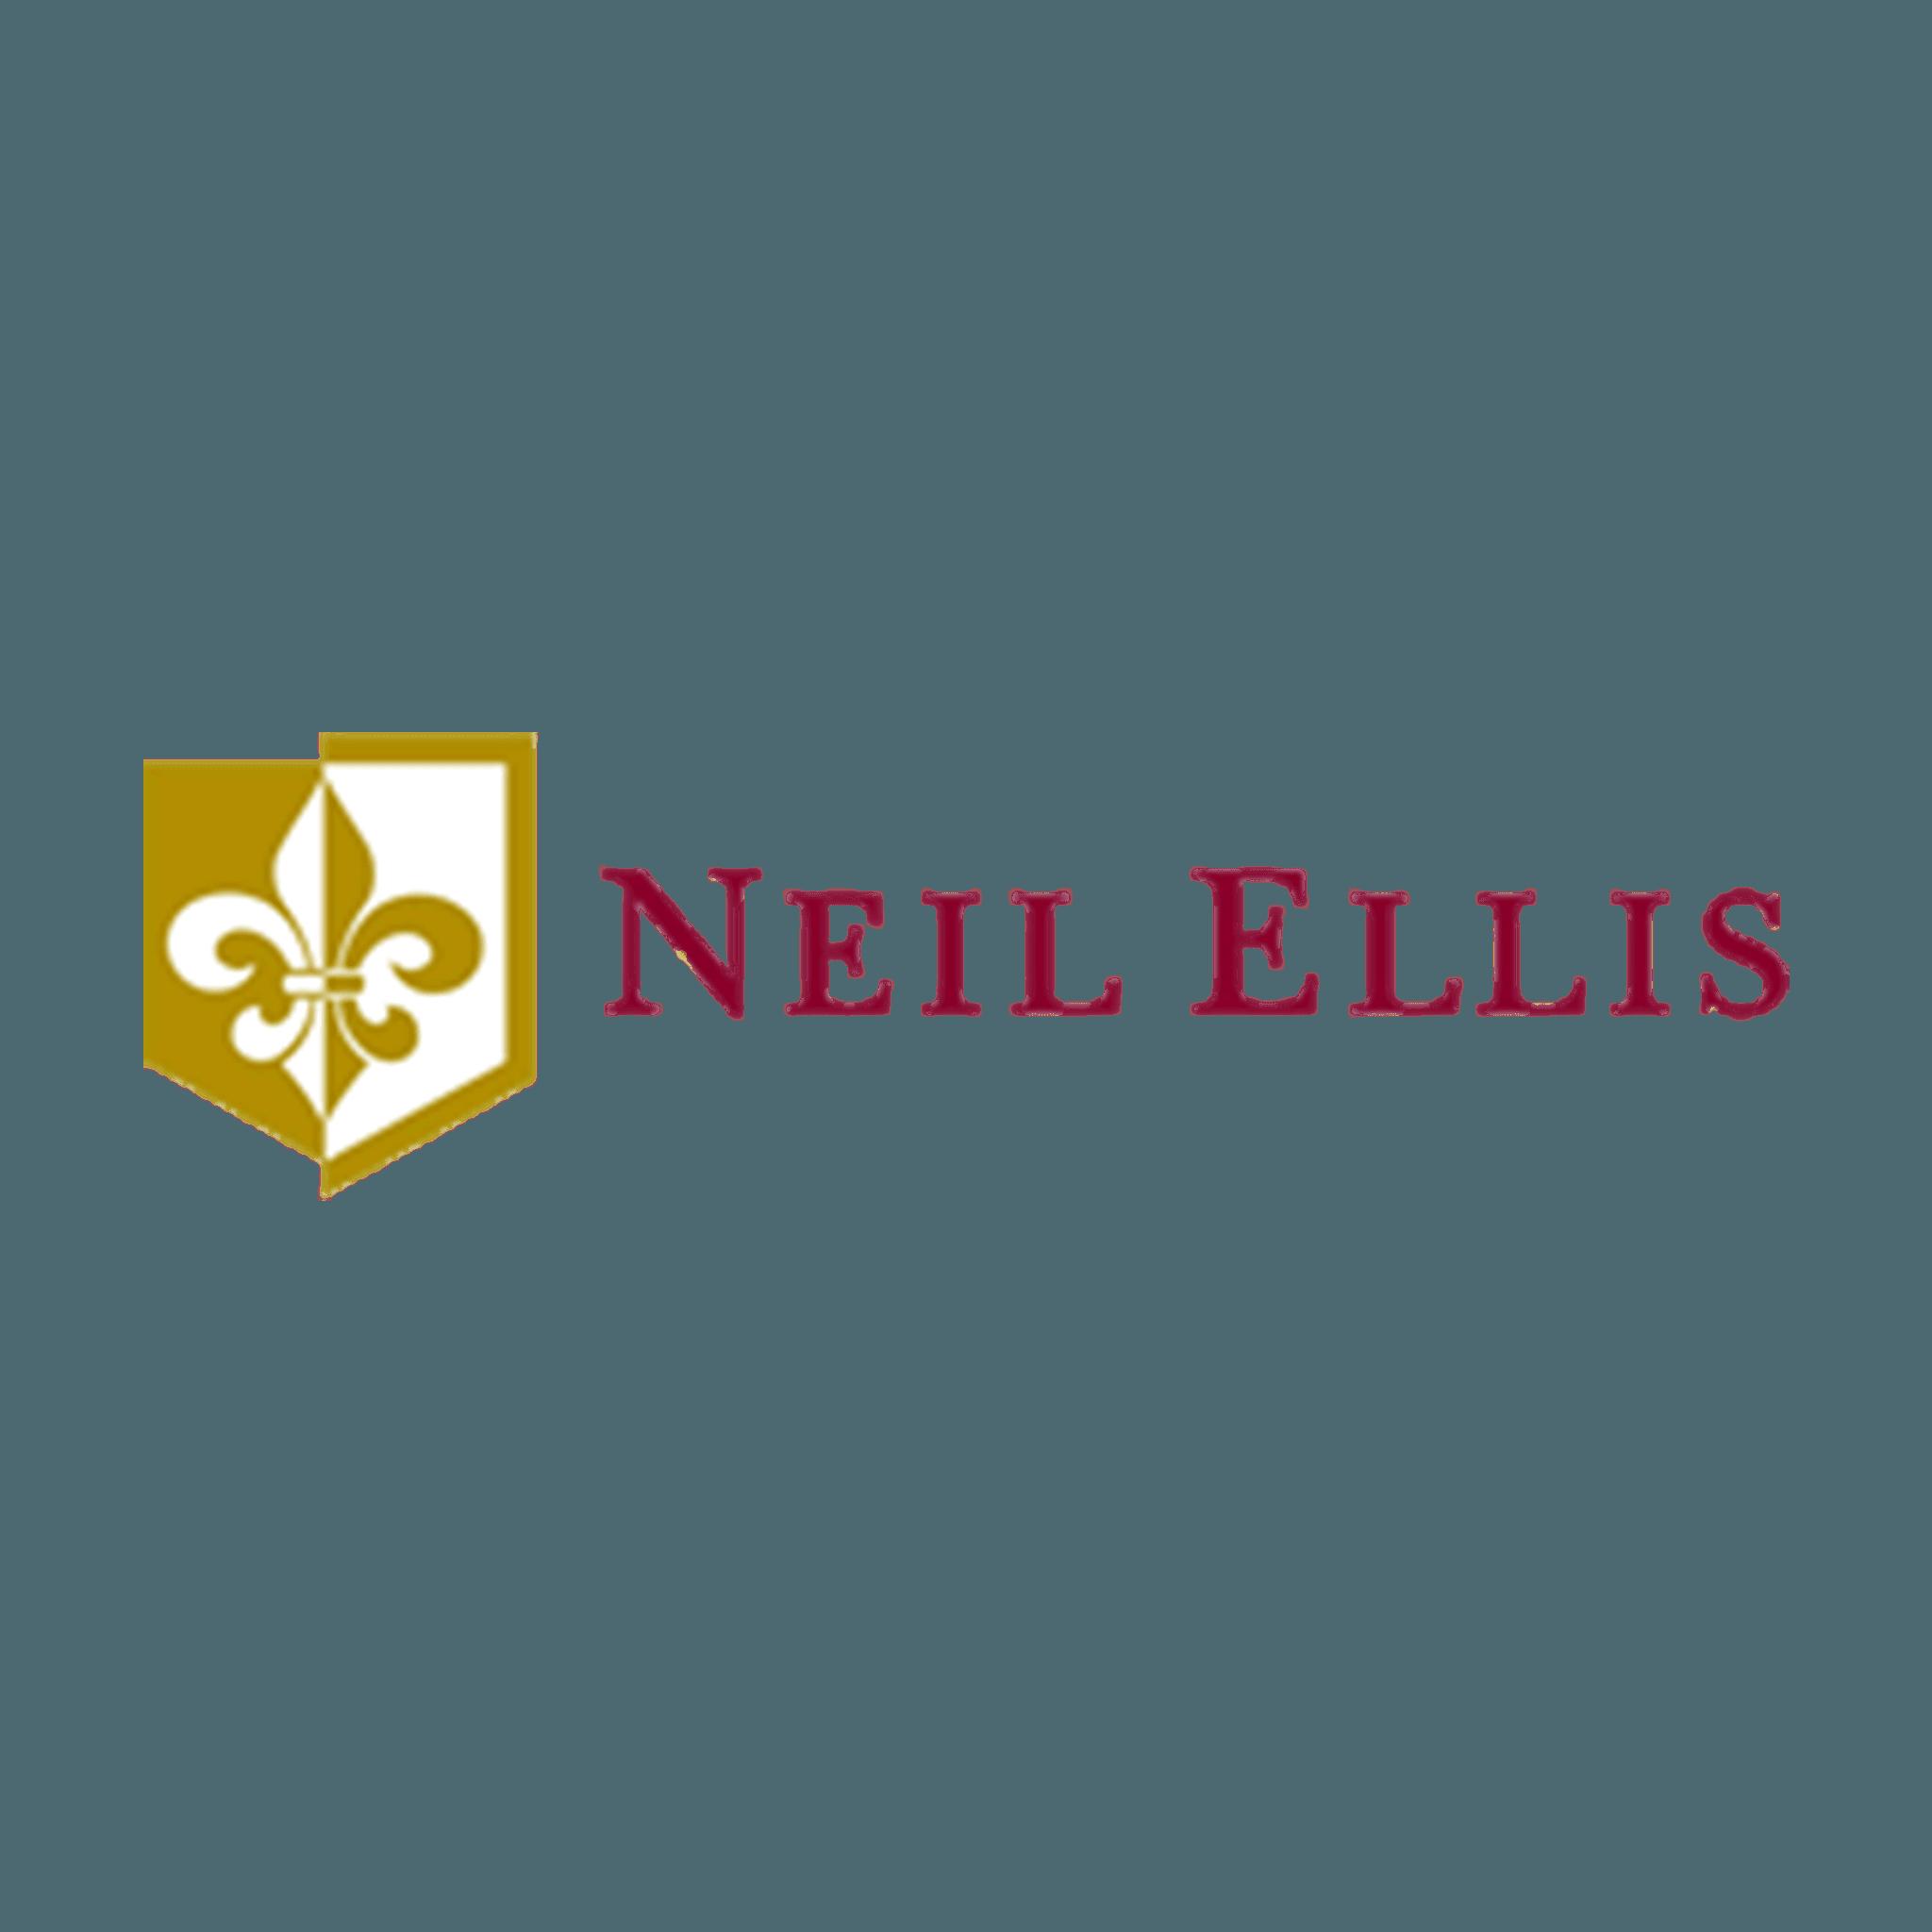 Neil Ellis State Logo